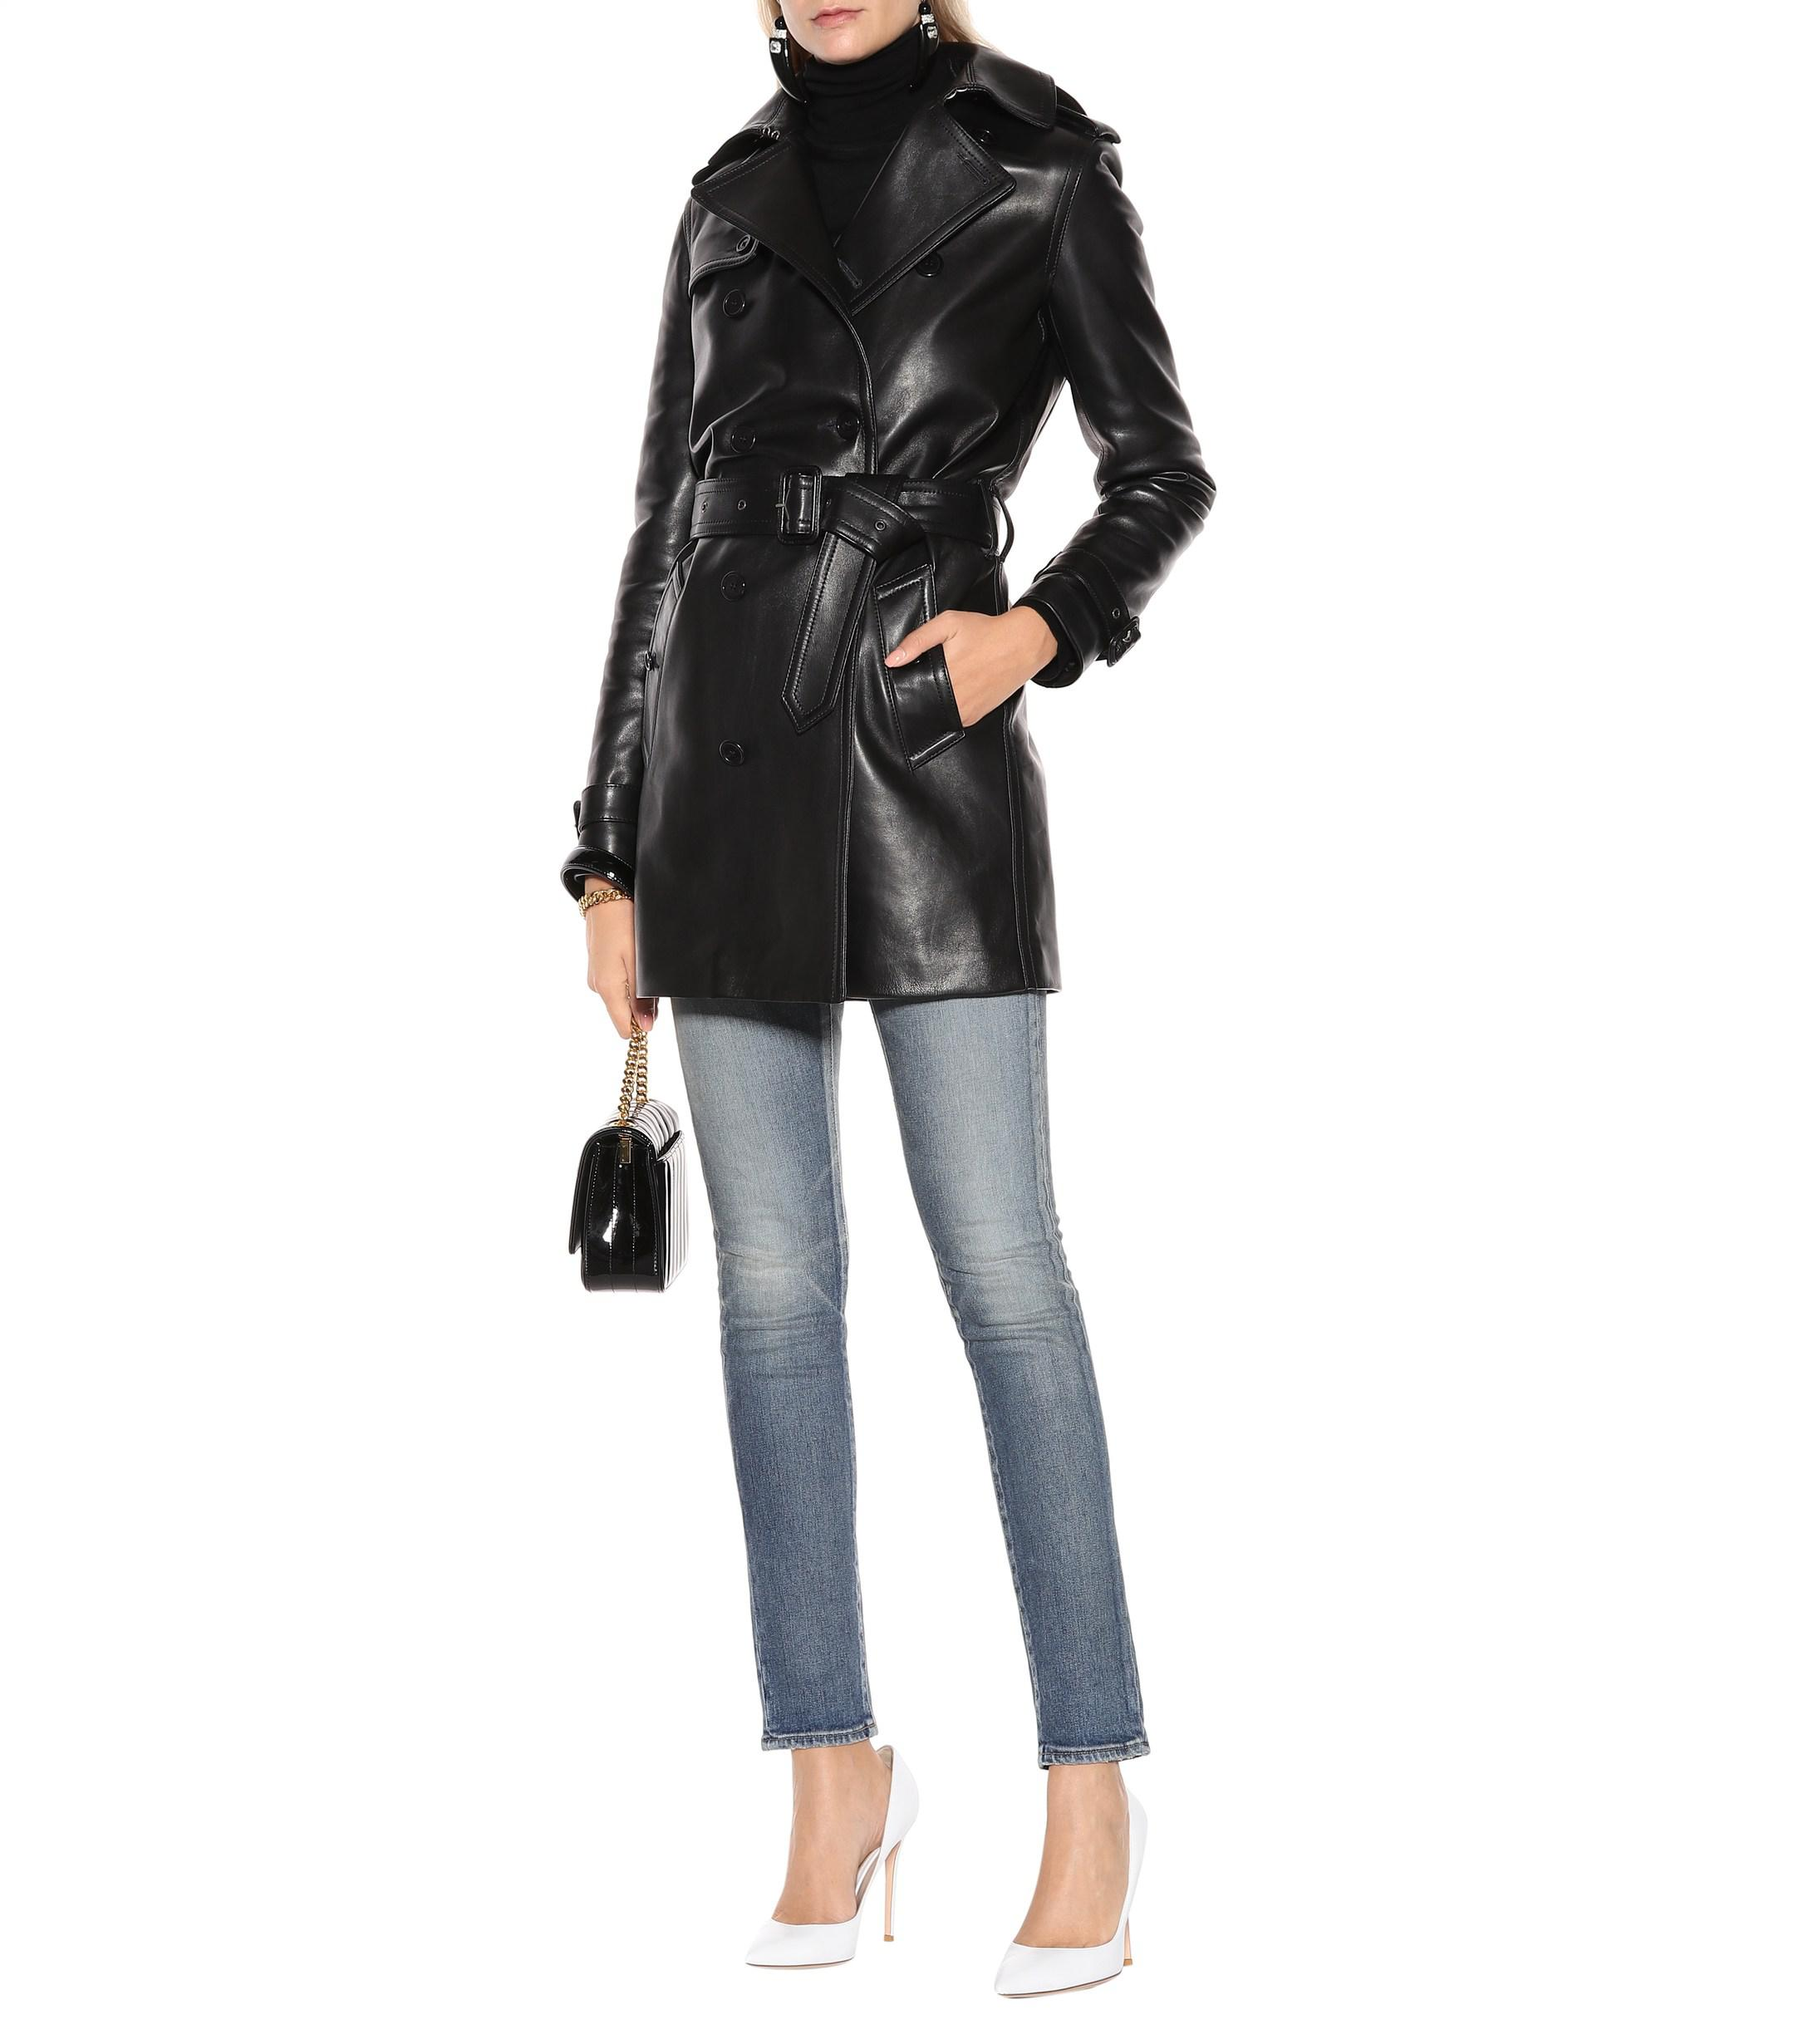 bcd73381e4c Saint Laurent - Black Leather Trench Coat - Lyst. View fullscreen